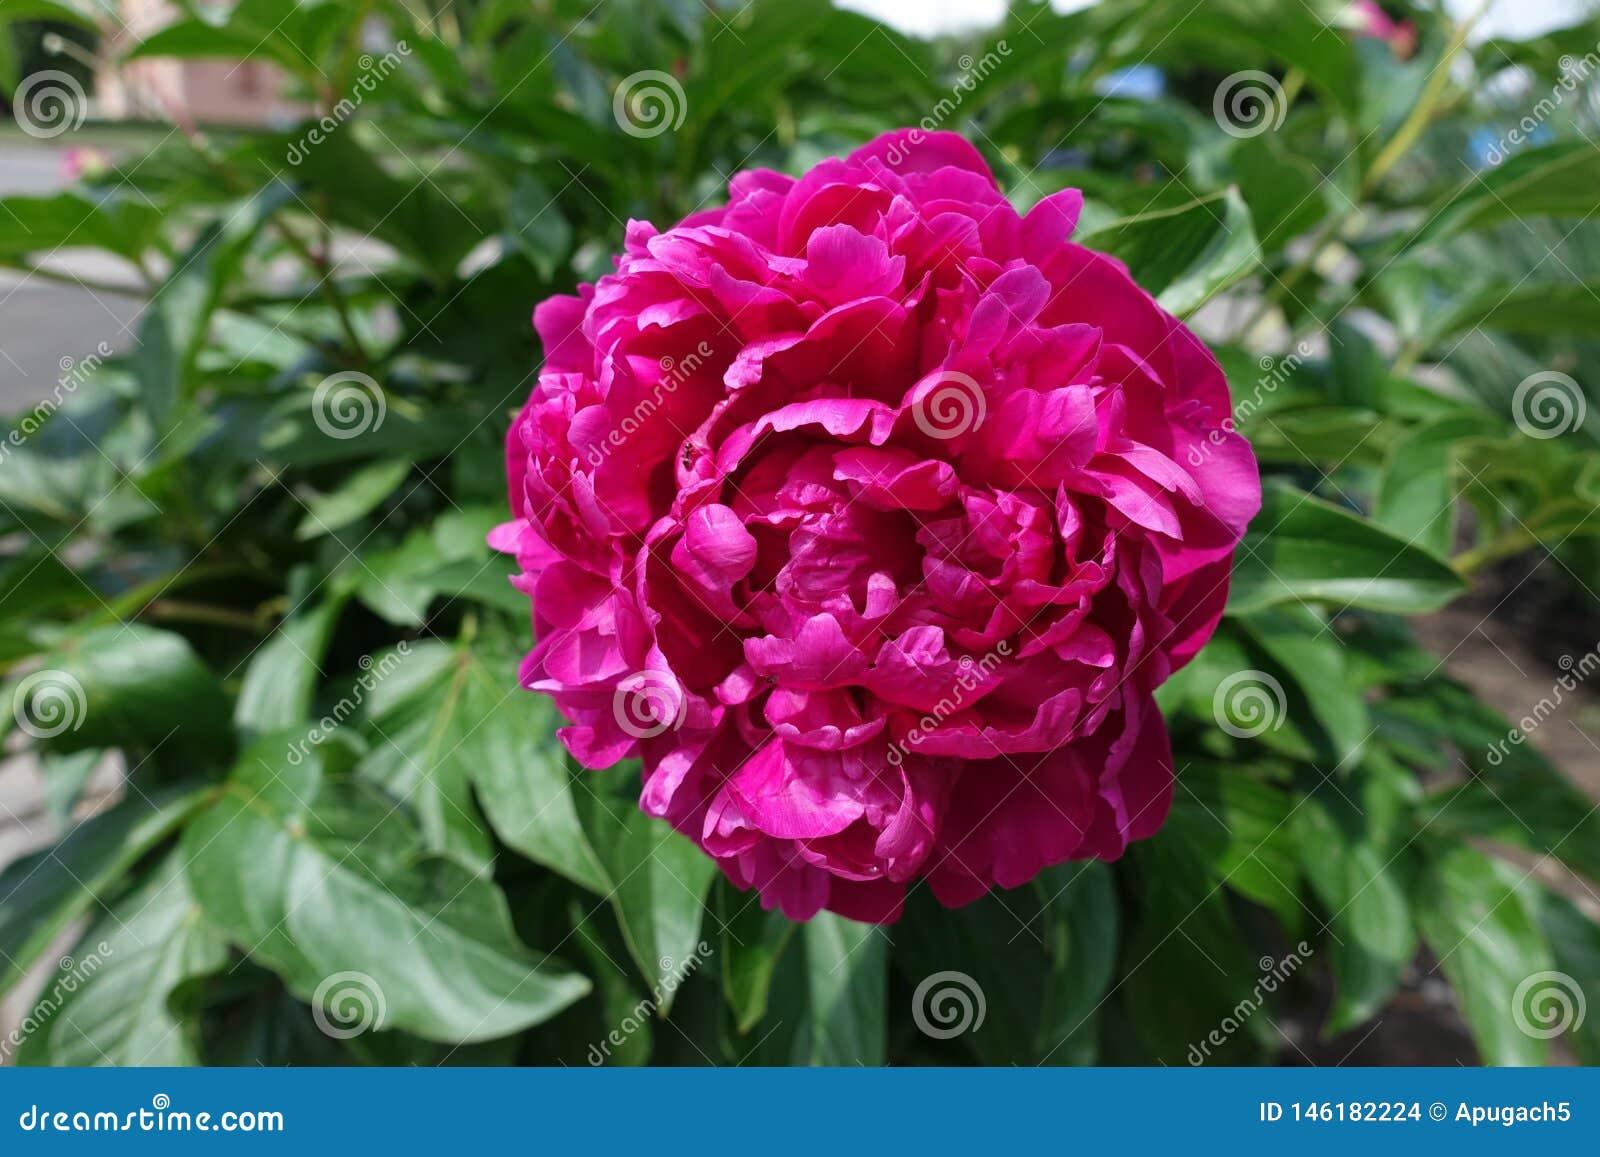 Deep pink flower of peony in spring